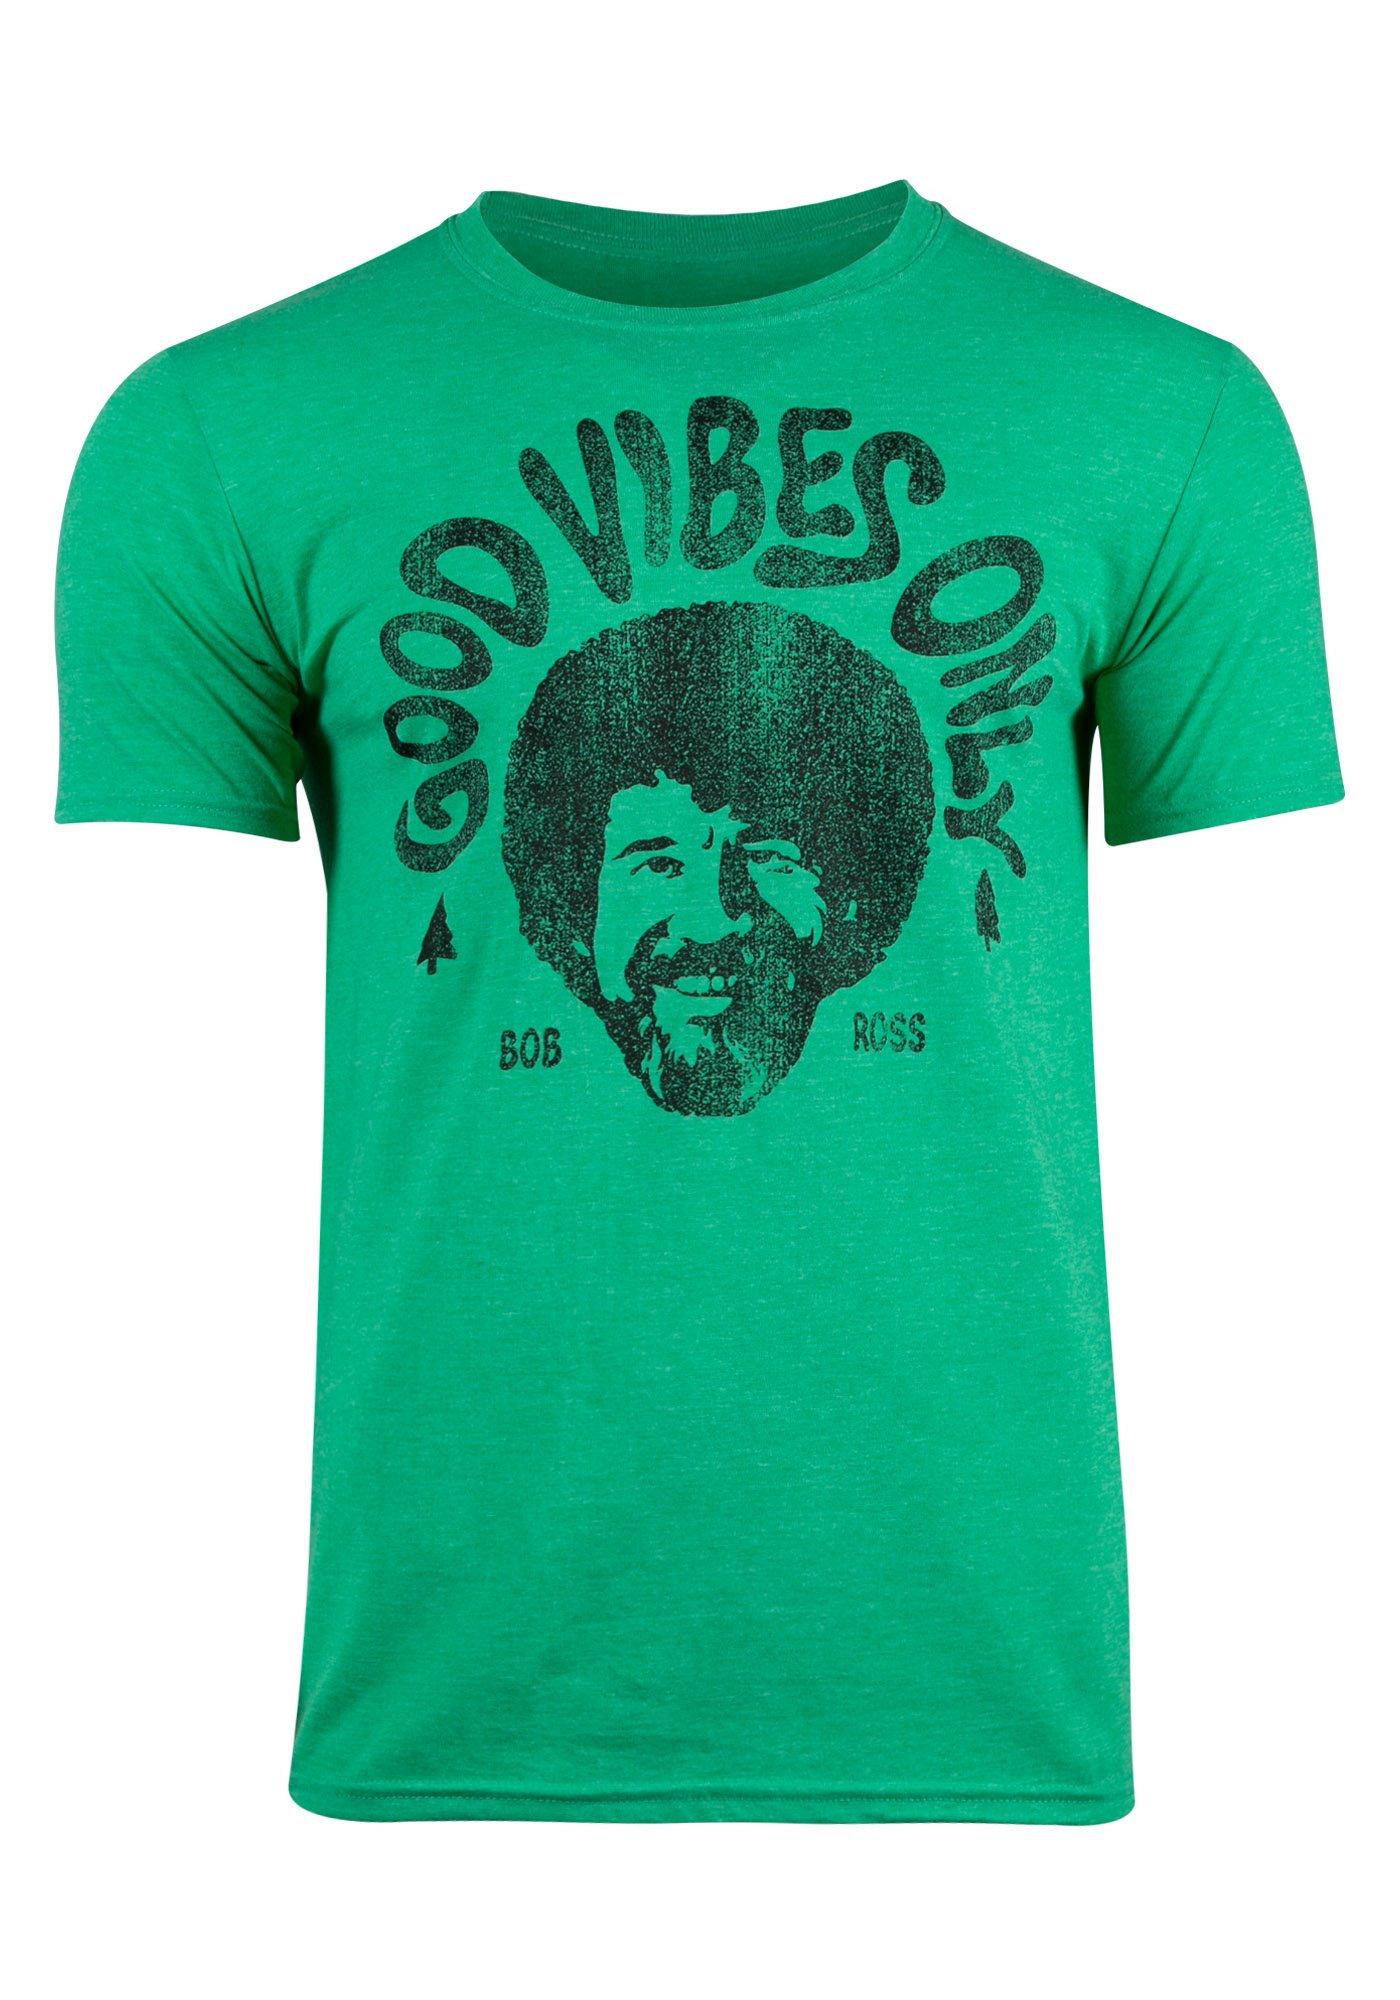 4b7d163ed Men's Bob Ross Good Vibes Only Tee, KELLY GREEN, hi-res